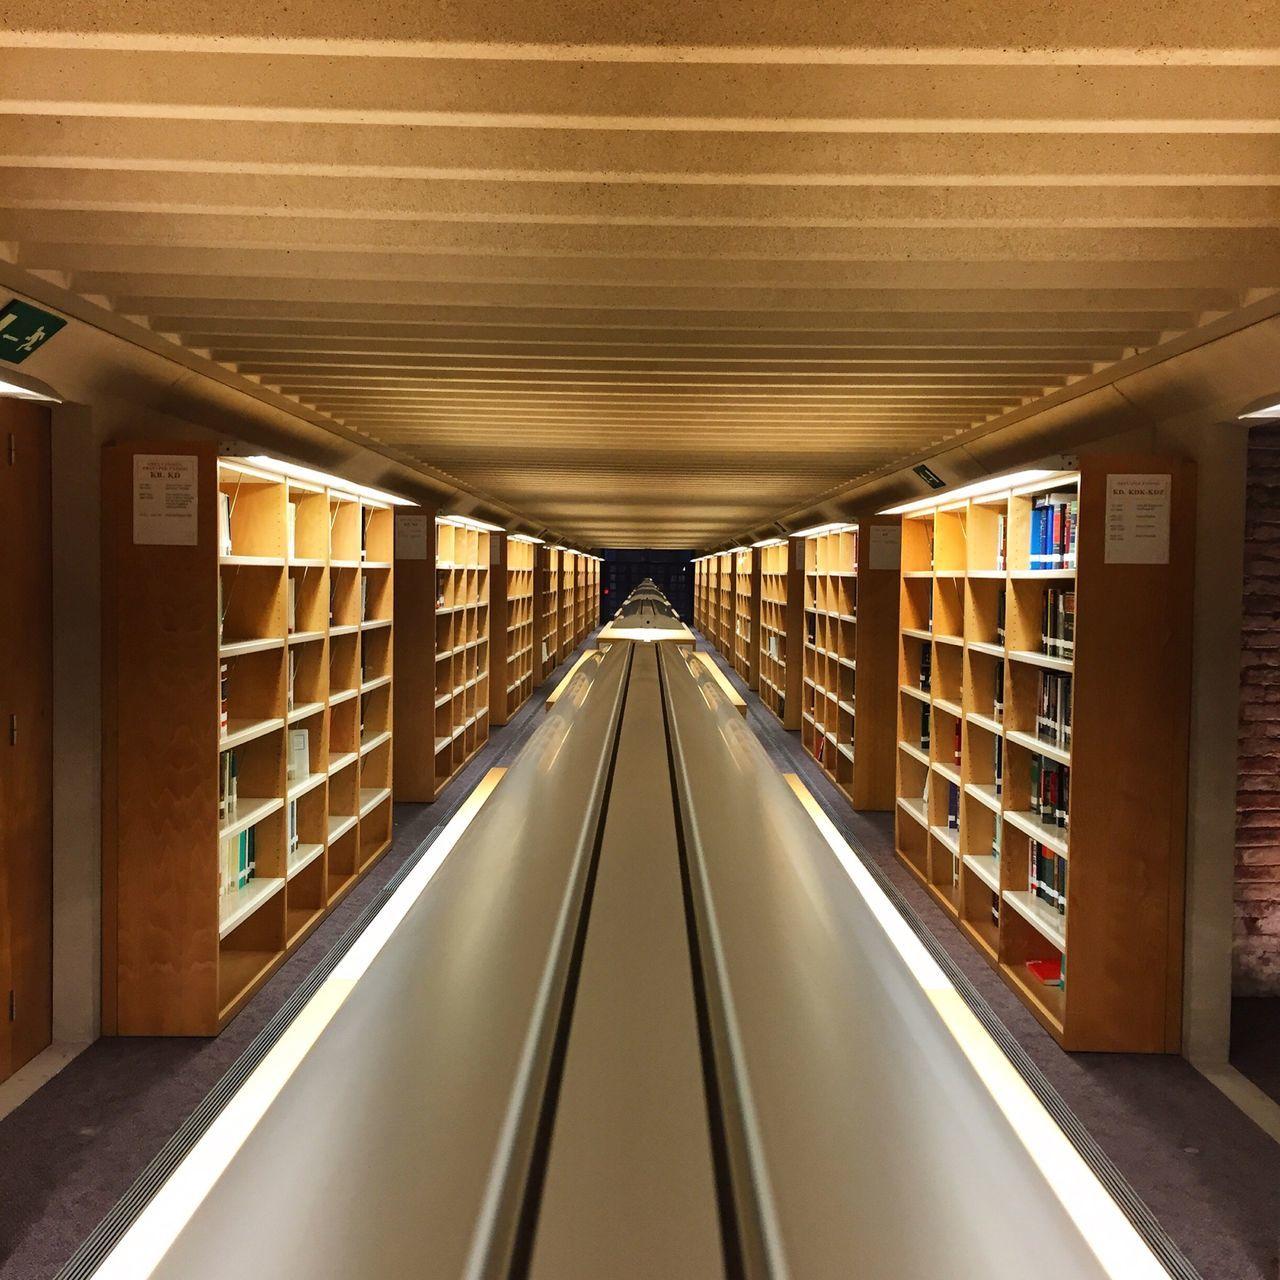 Beautiful stock photos of library, Architecture, Arrangement, Bookshelf, Built Structure